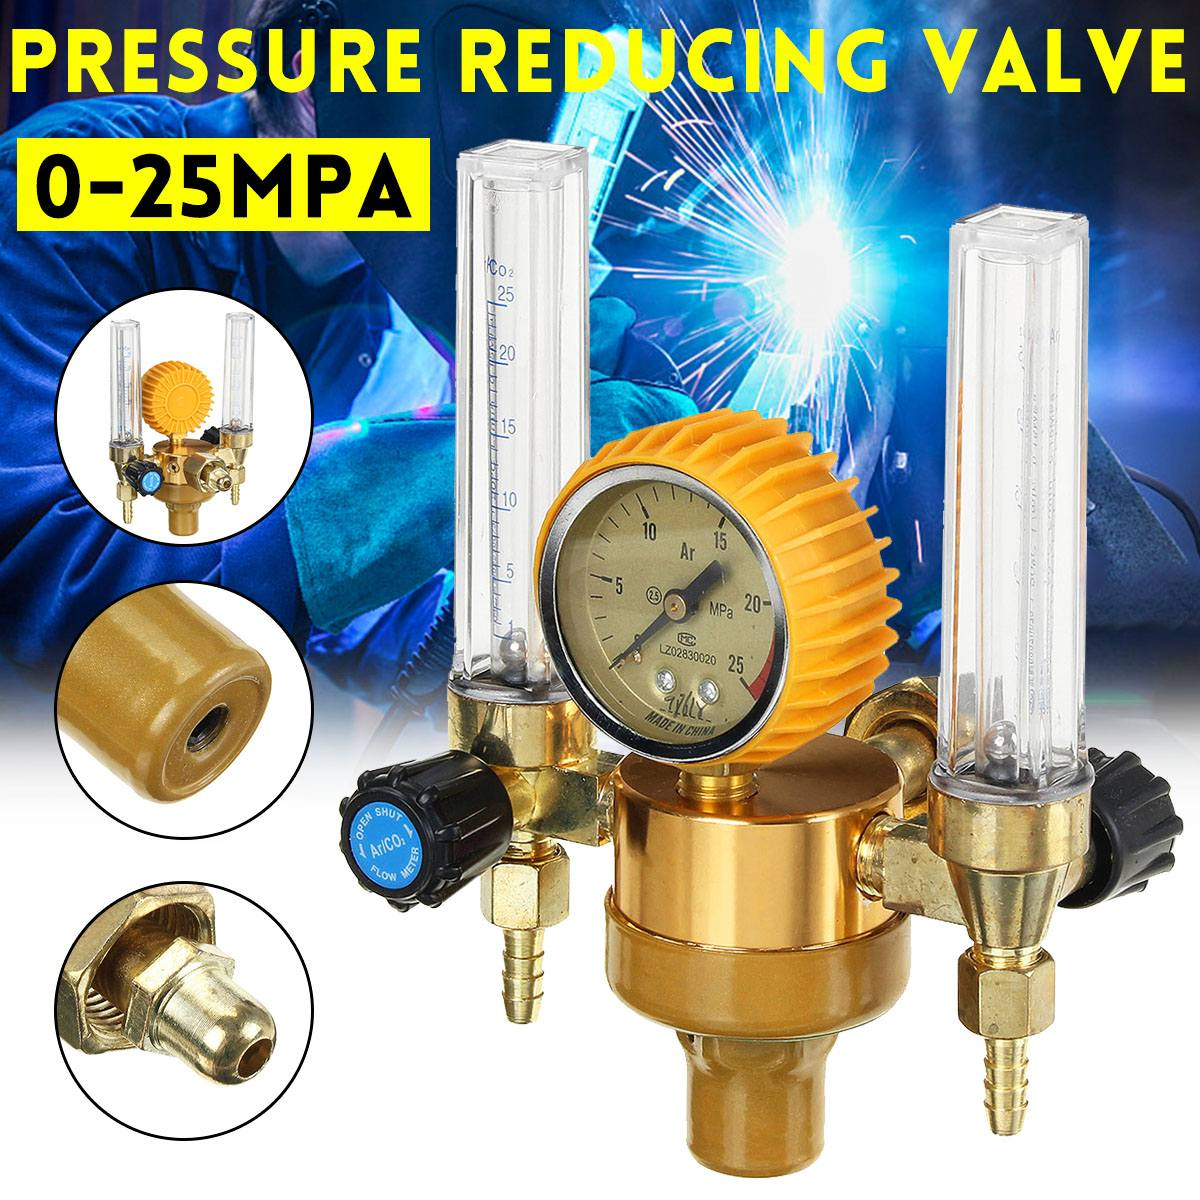 Pressure Value Argon Gas Regulator Reducer Double-tube Meter Flowmeter Argon Arc Welder Special Rressure Rreducing Air Valve